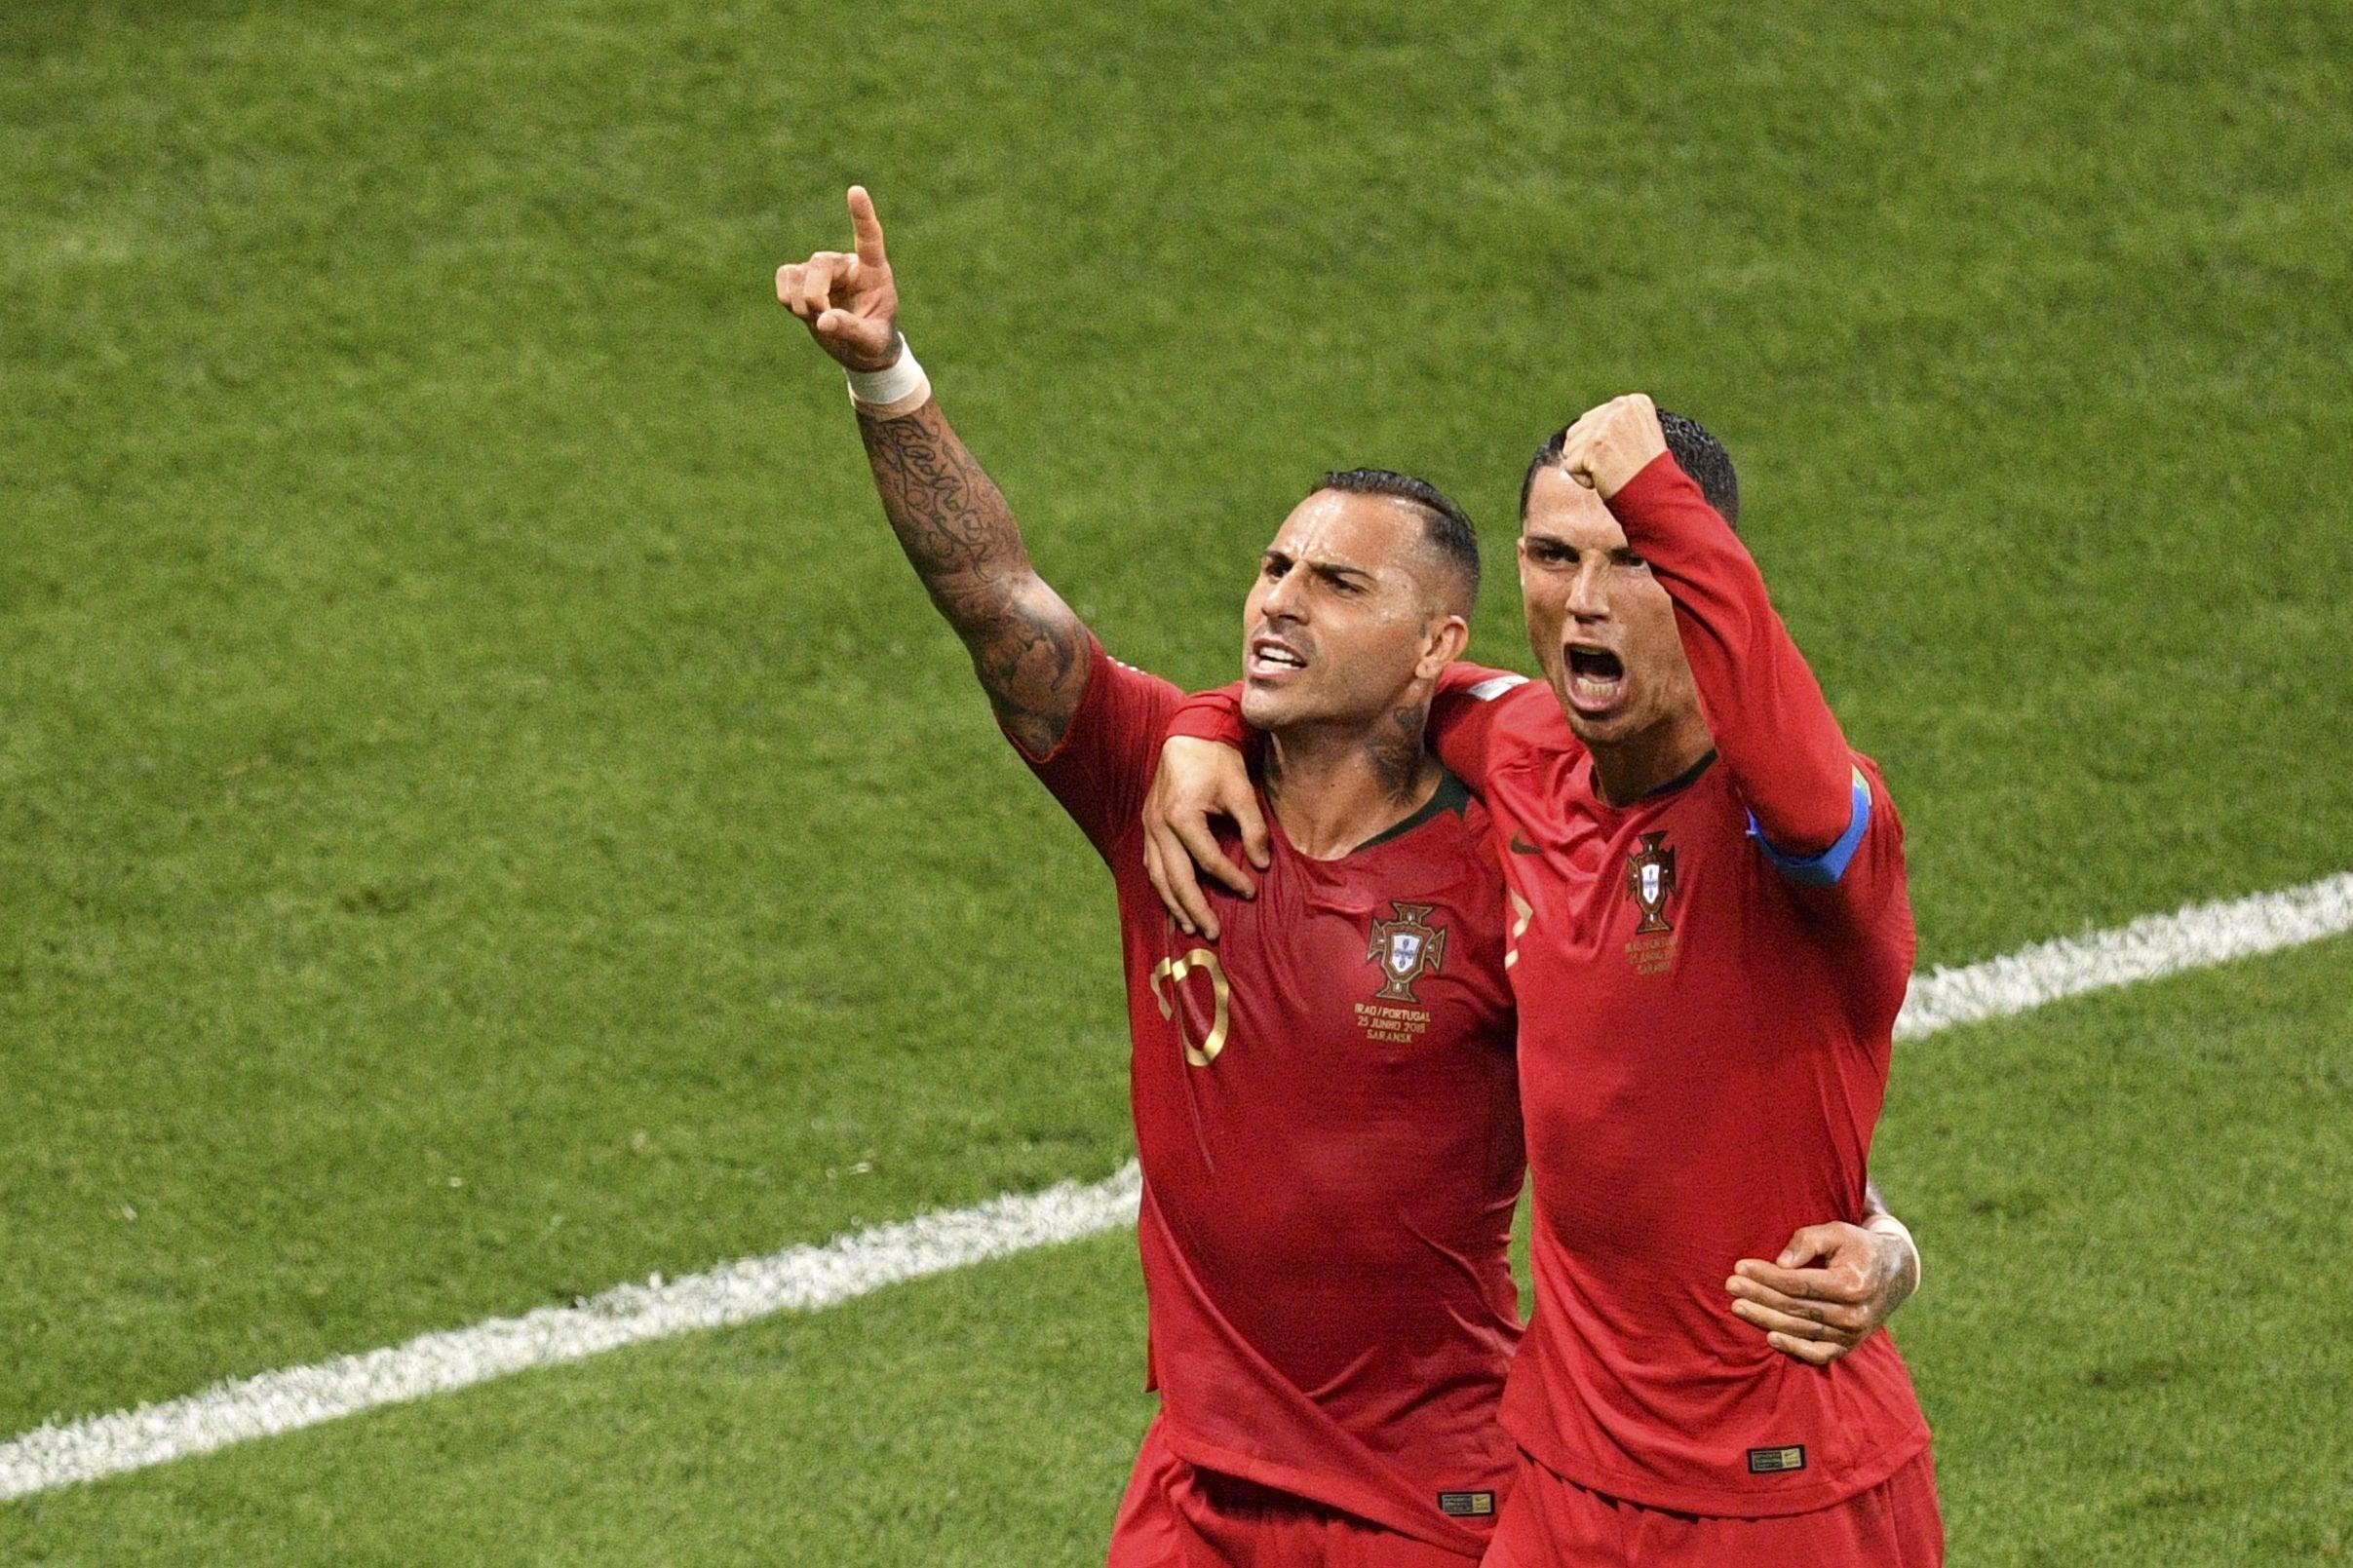 Iran vs Portugal, LIVE World Cup 2018: Cristiano Ronaldo misses VAR